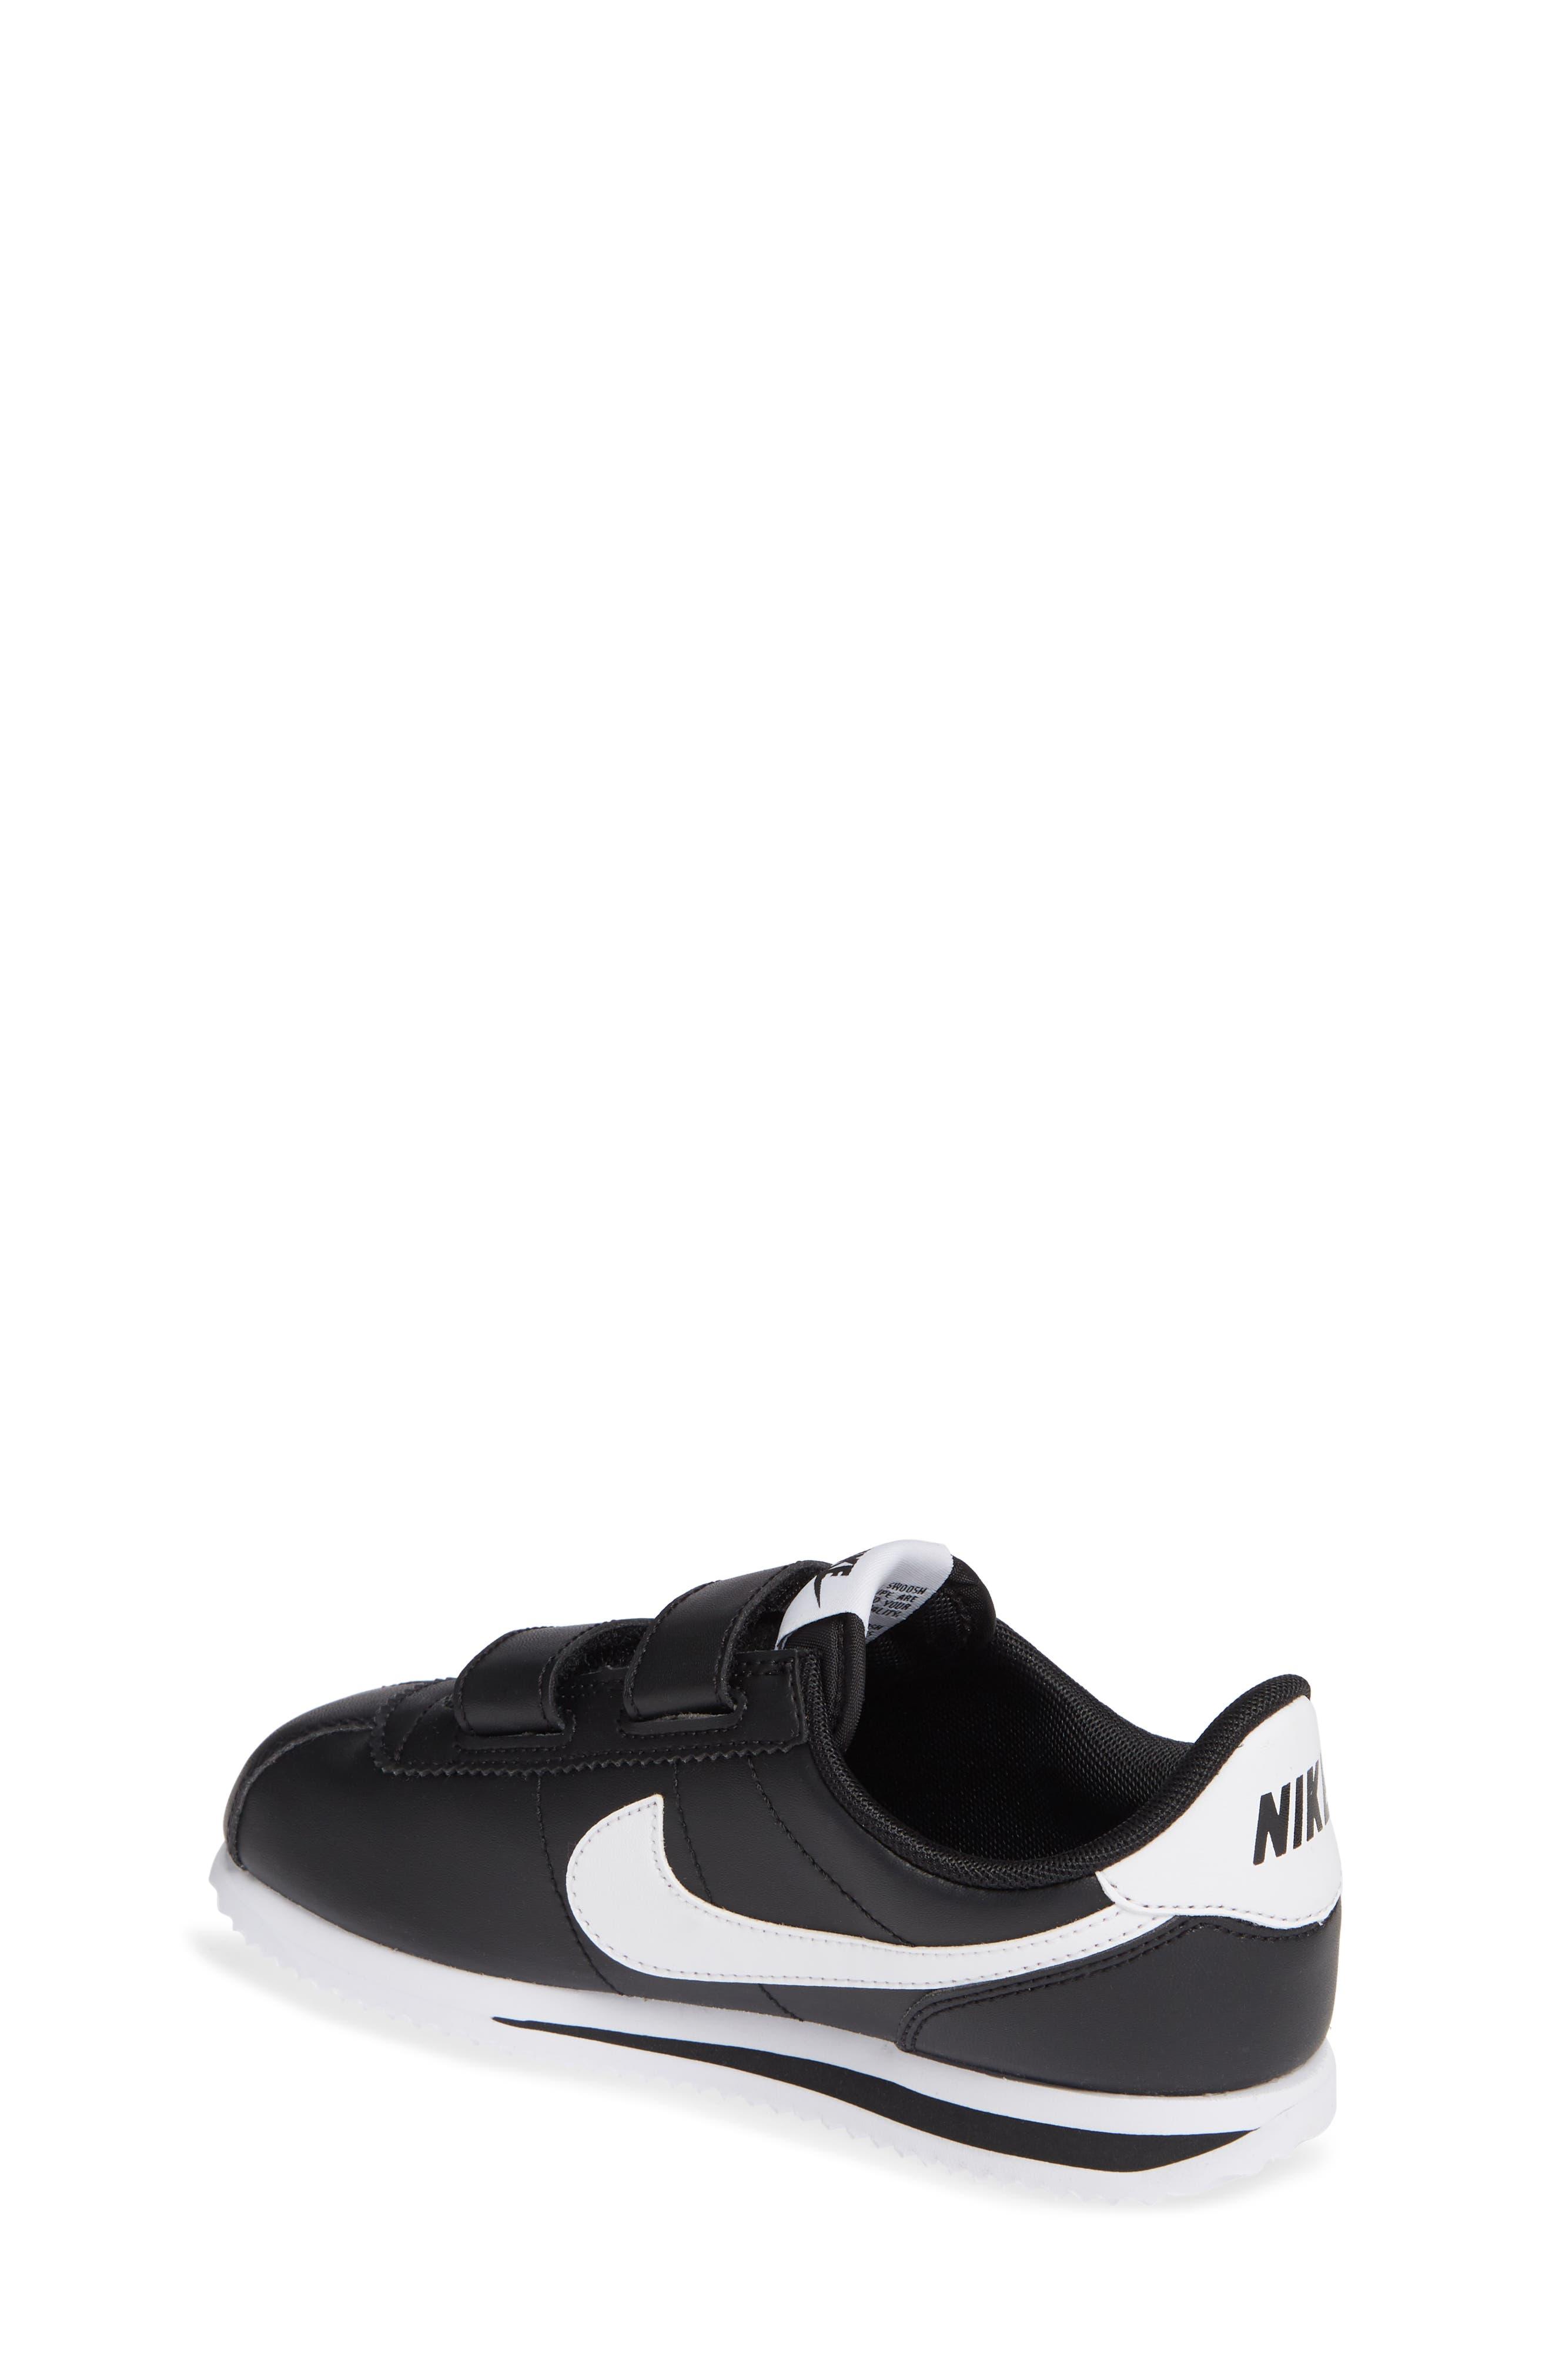 Cortez Basic SL Sneaker,                             Alternate thumbnail 2, color,                             Black/ White